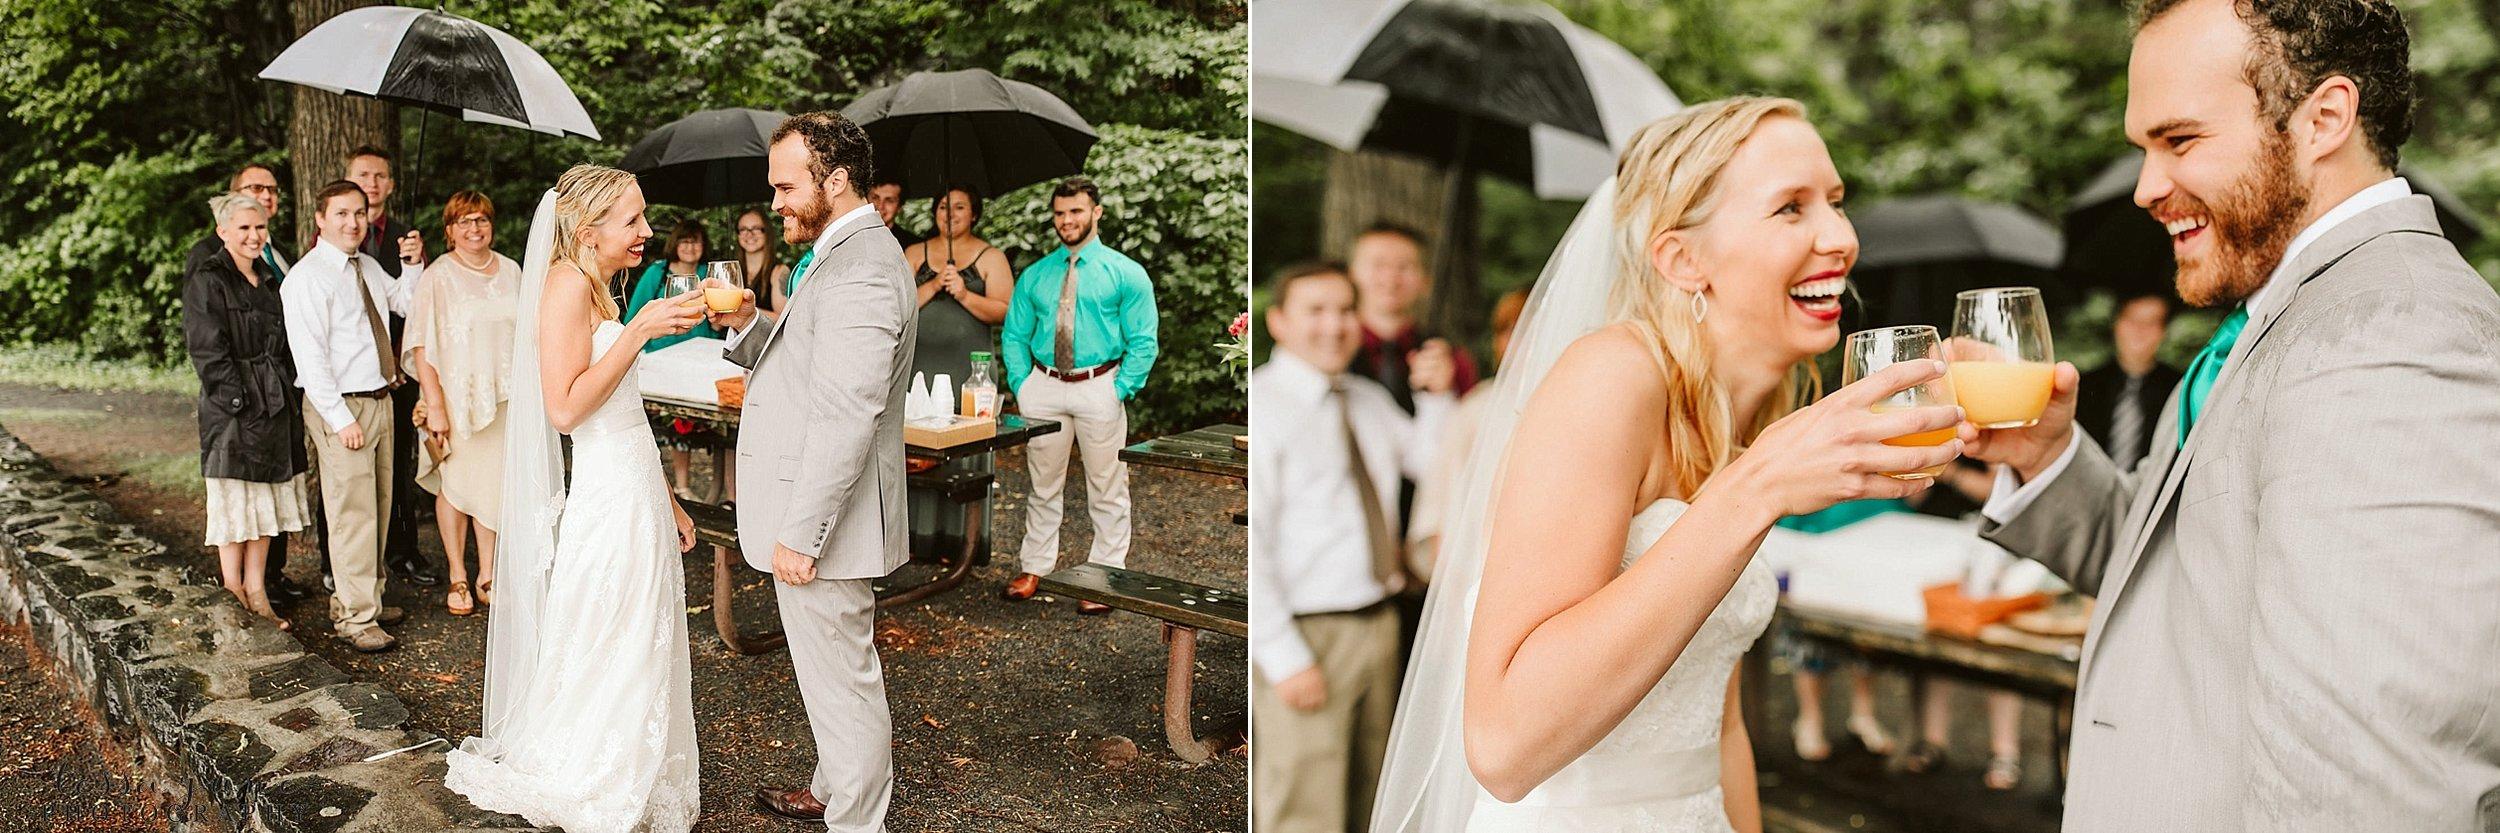 taylors-falls-rainy-elopement-wedding-interstate-state-park-99.jpg